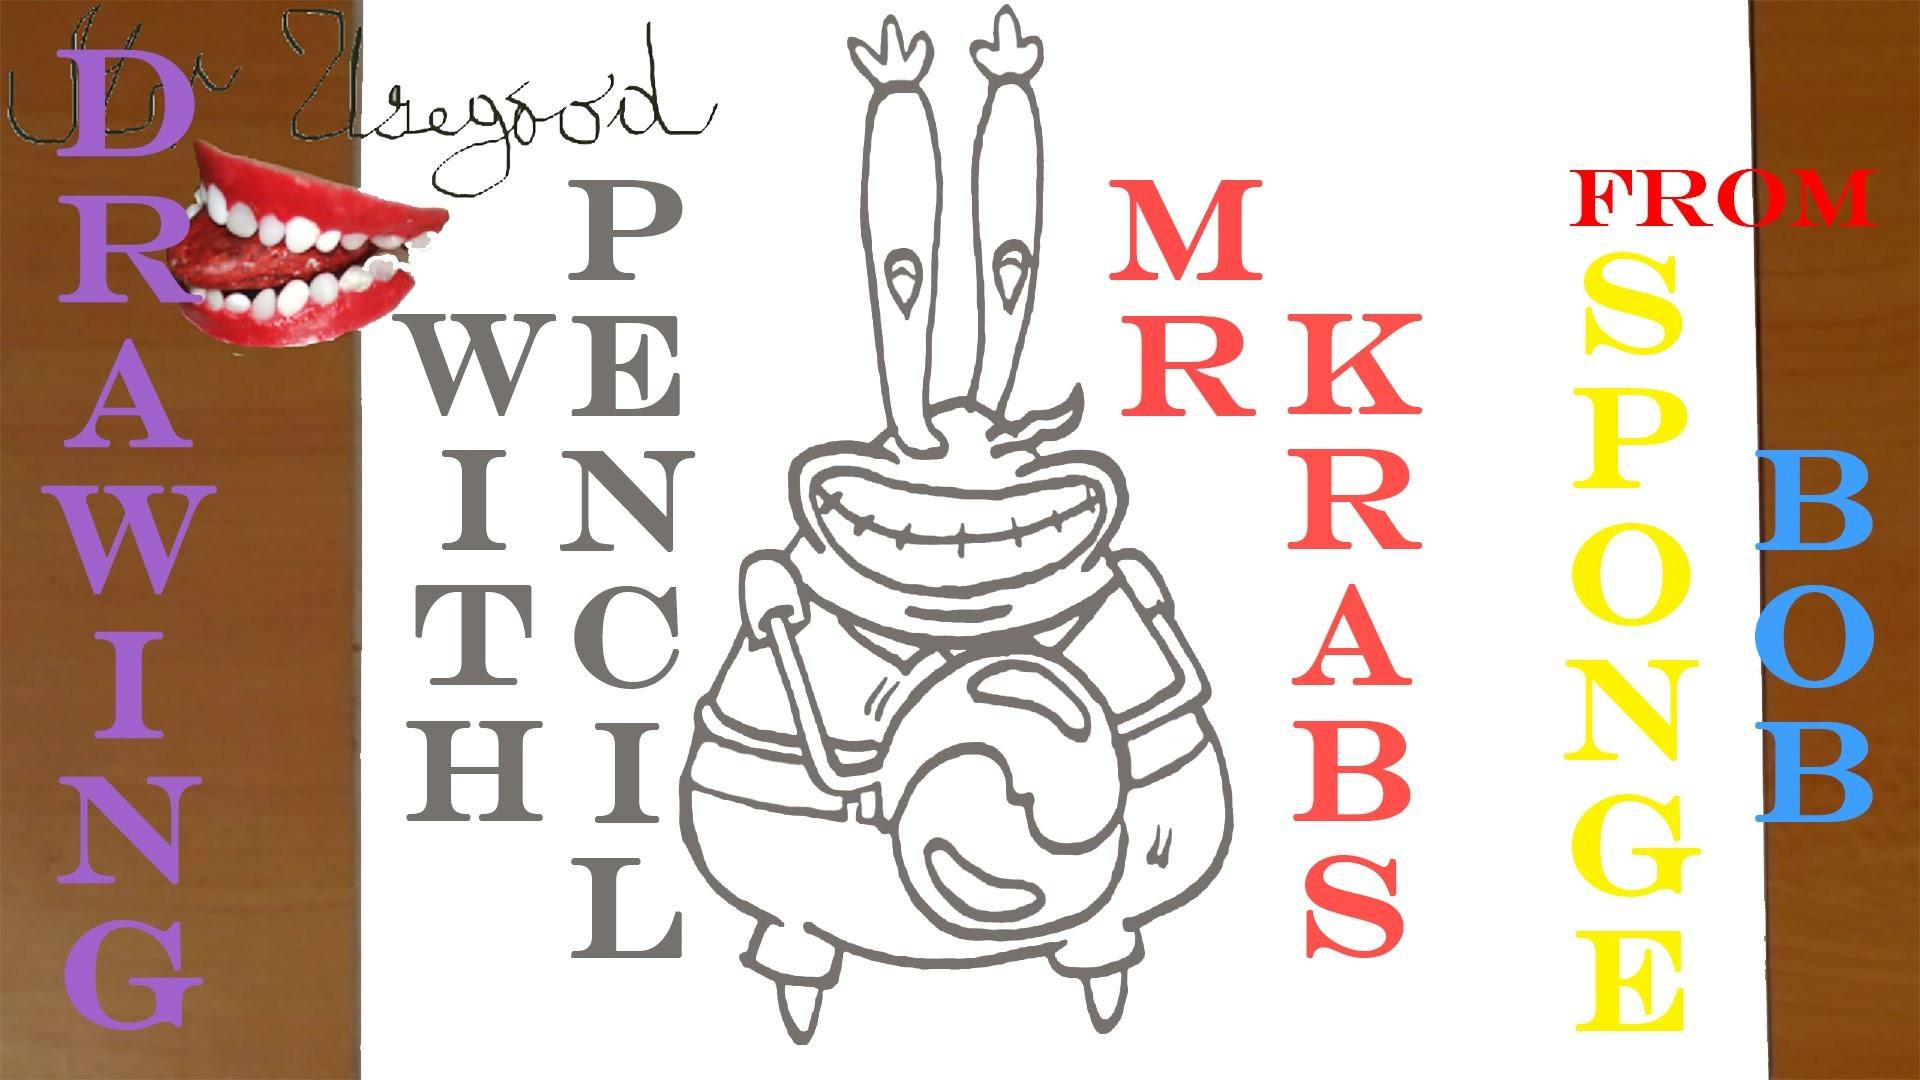 How to draw MR KRABS from Spongebob Squarepants EASY   draw easy stuff, PENCIL   SPEED ART